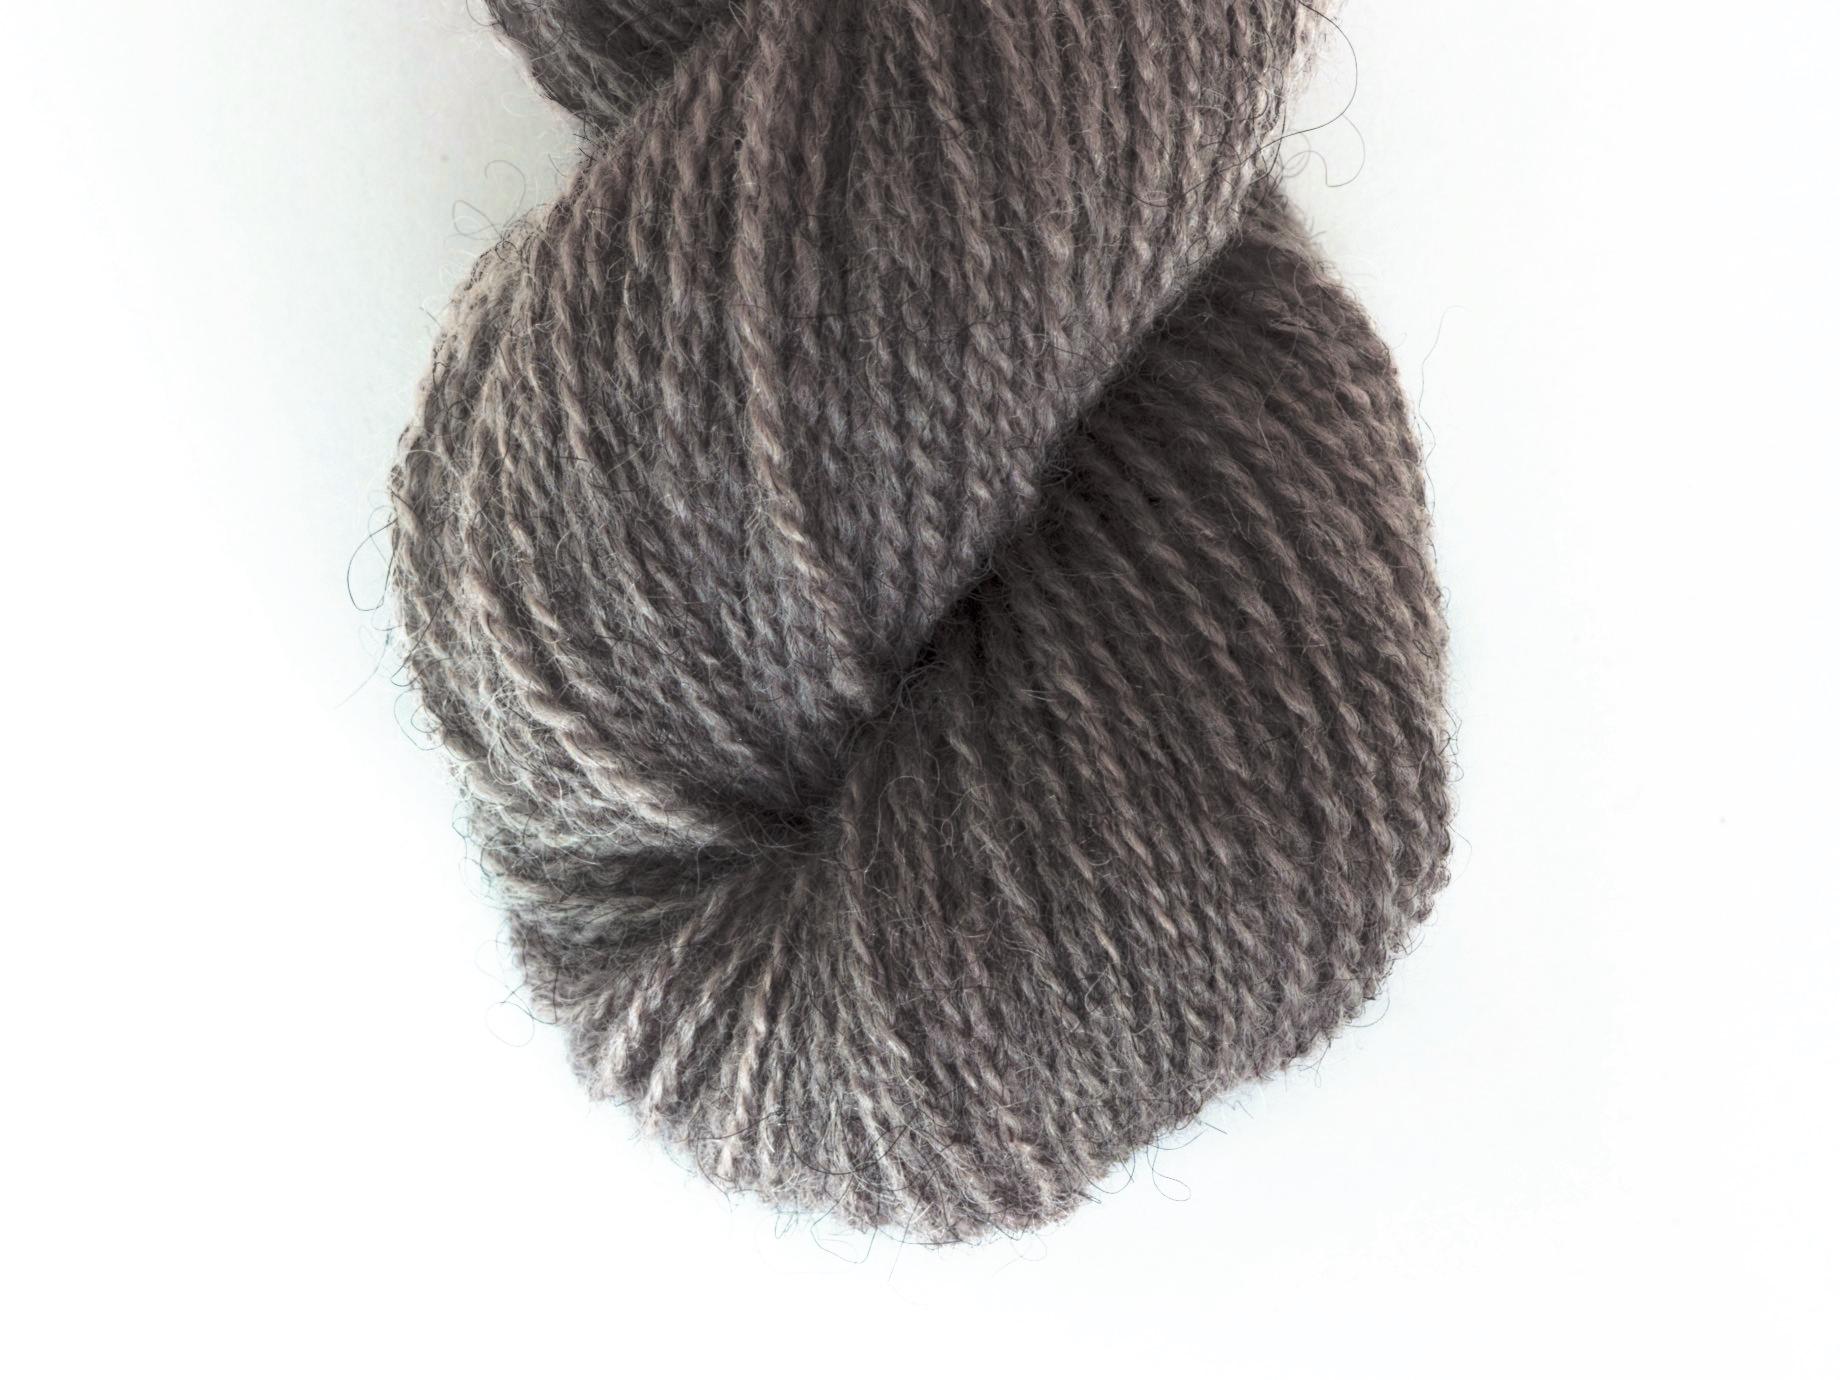 Bohus Stickning garn yarn main color natural dark gray 100% wool